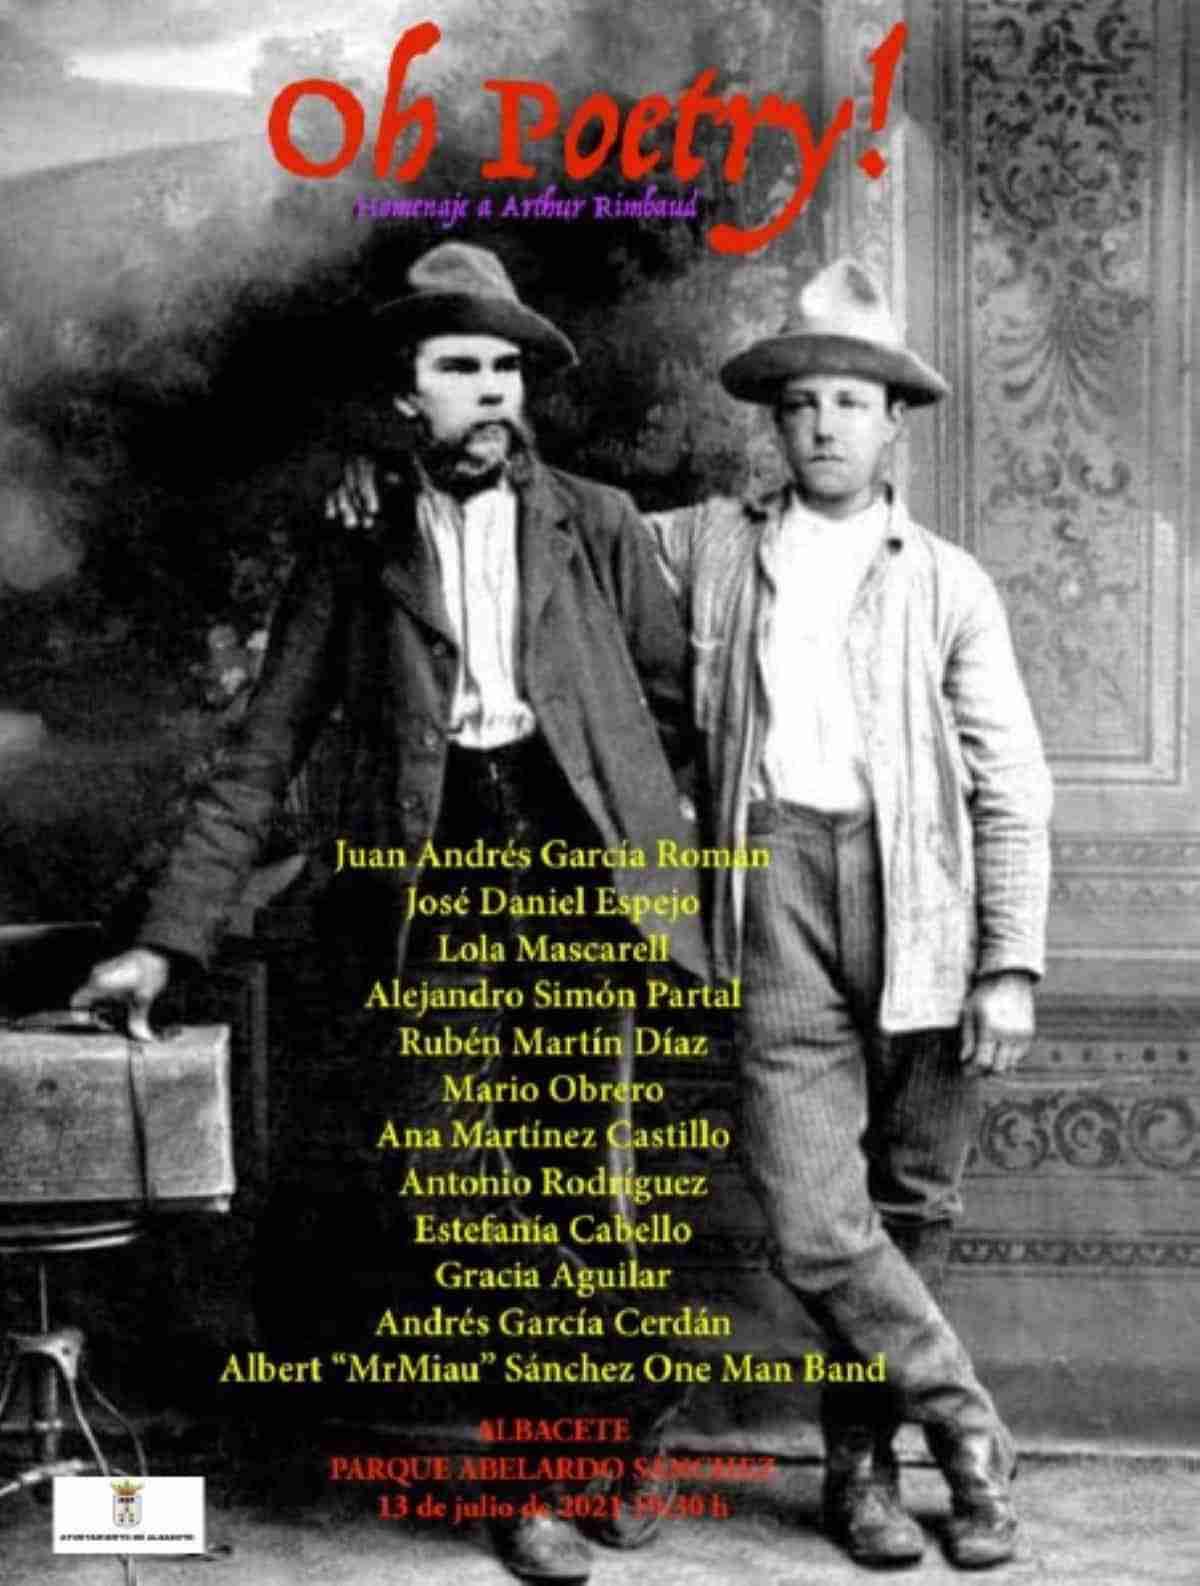 oh poetry homenaje arthur rimbaud albacete